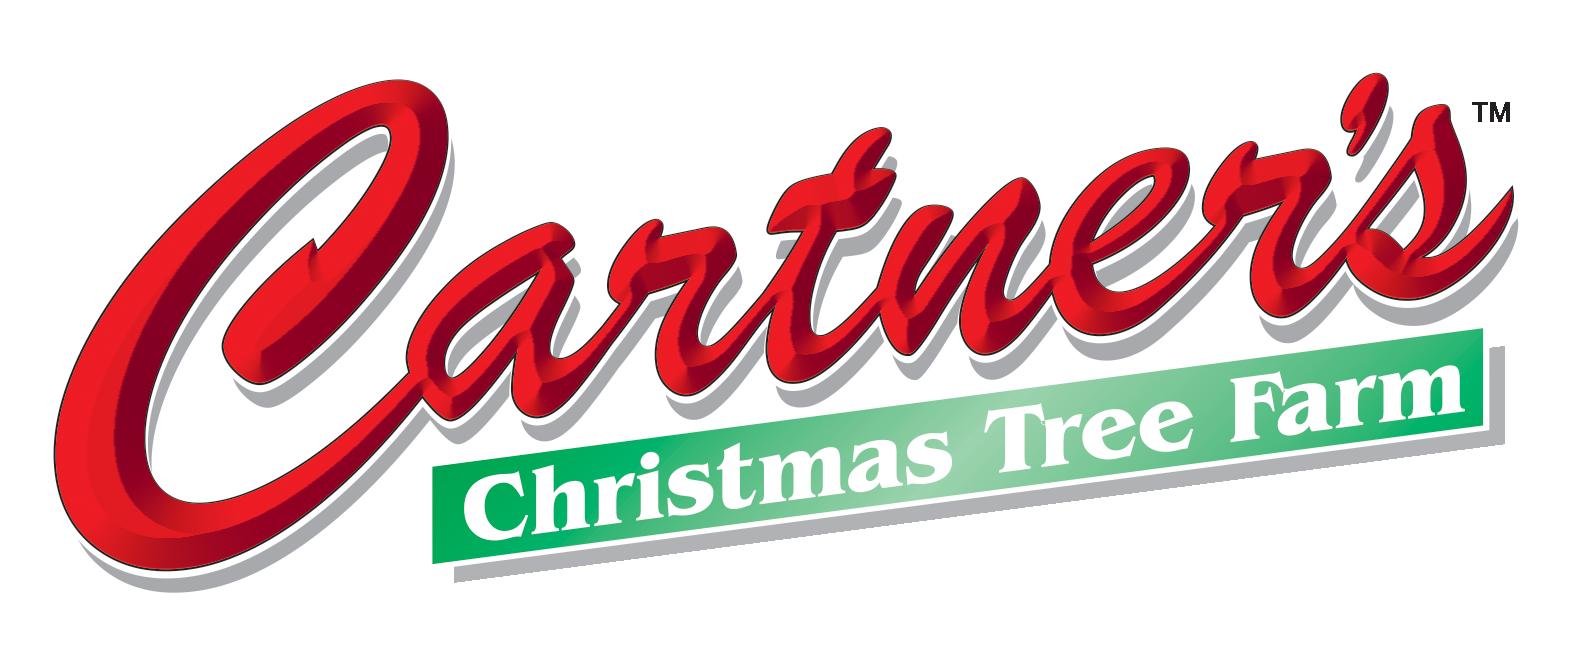 Cartner Christmas Tree Farm   Mail Order Home